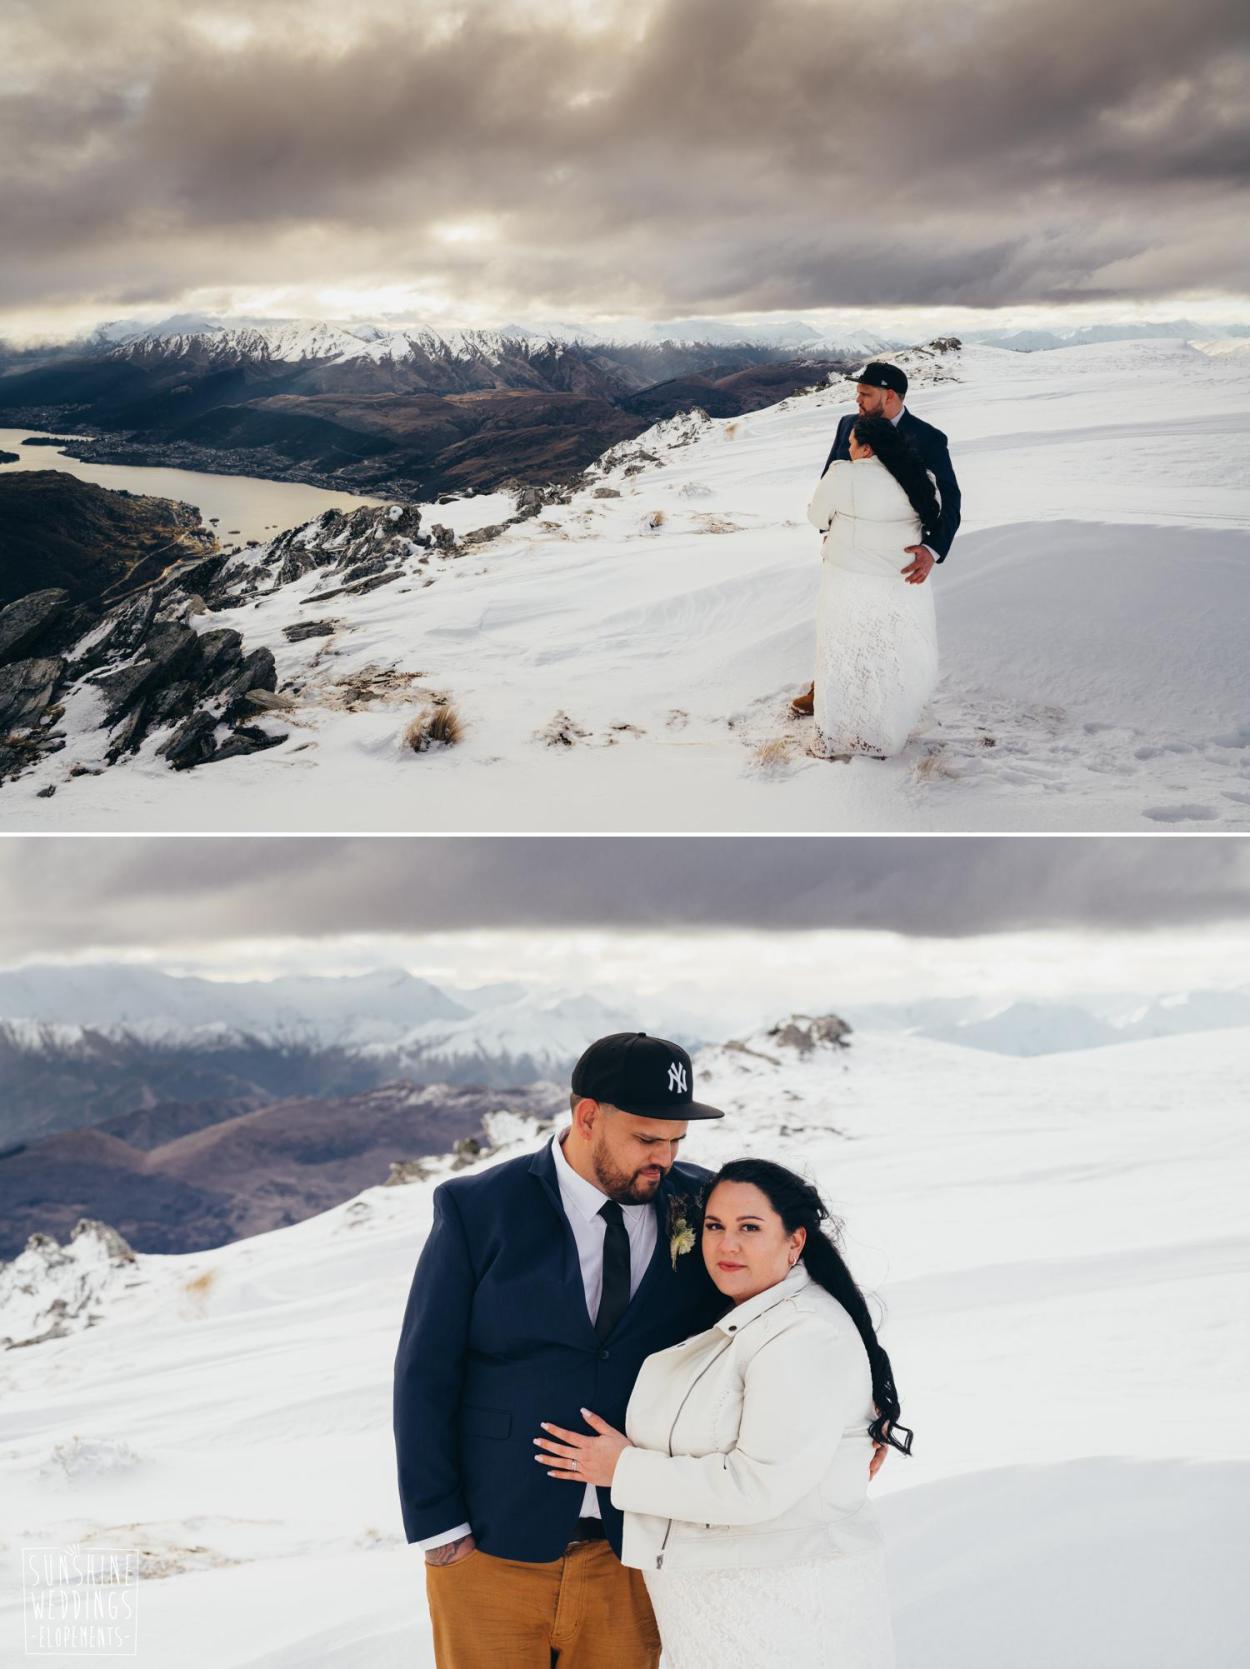 The Remarkable winter heli wedding